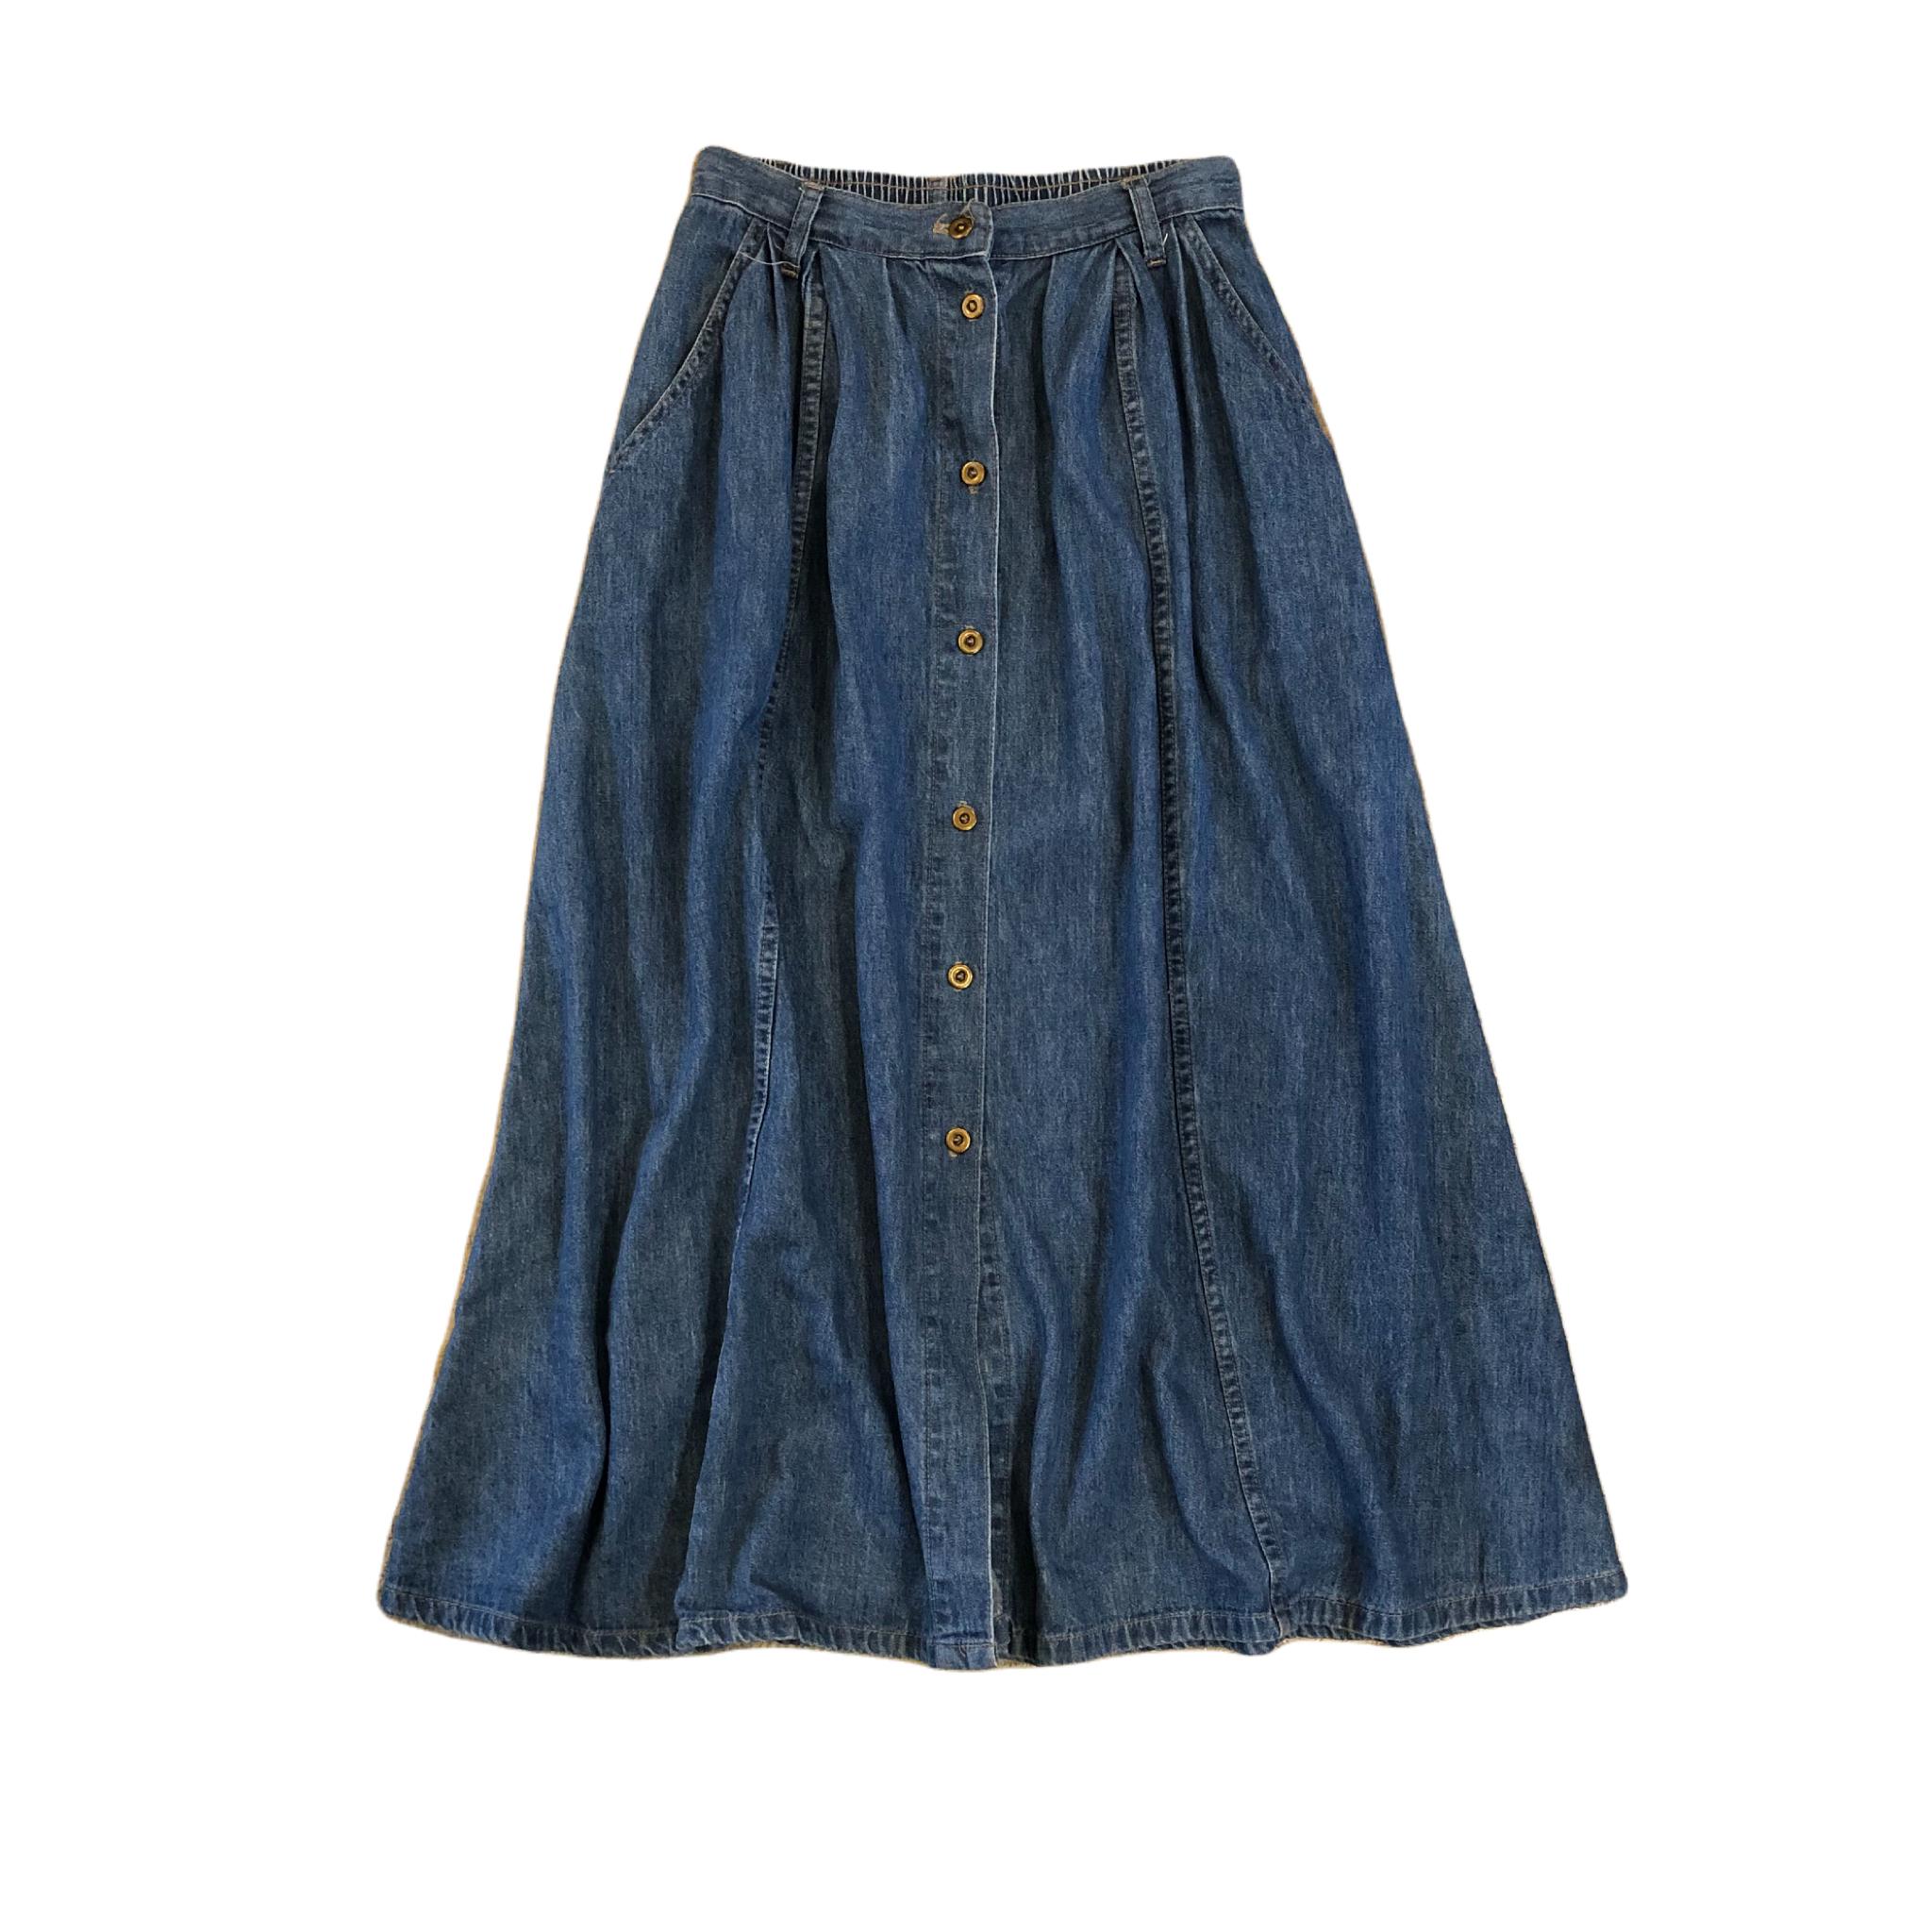 Stampede Denim Long Skirt ¥5,400+tax